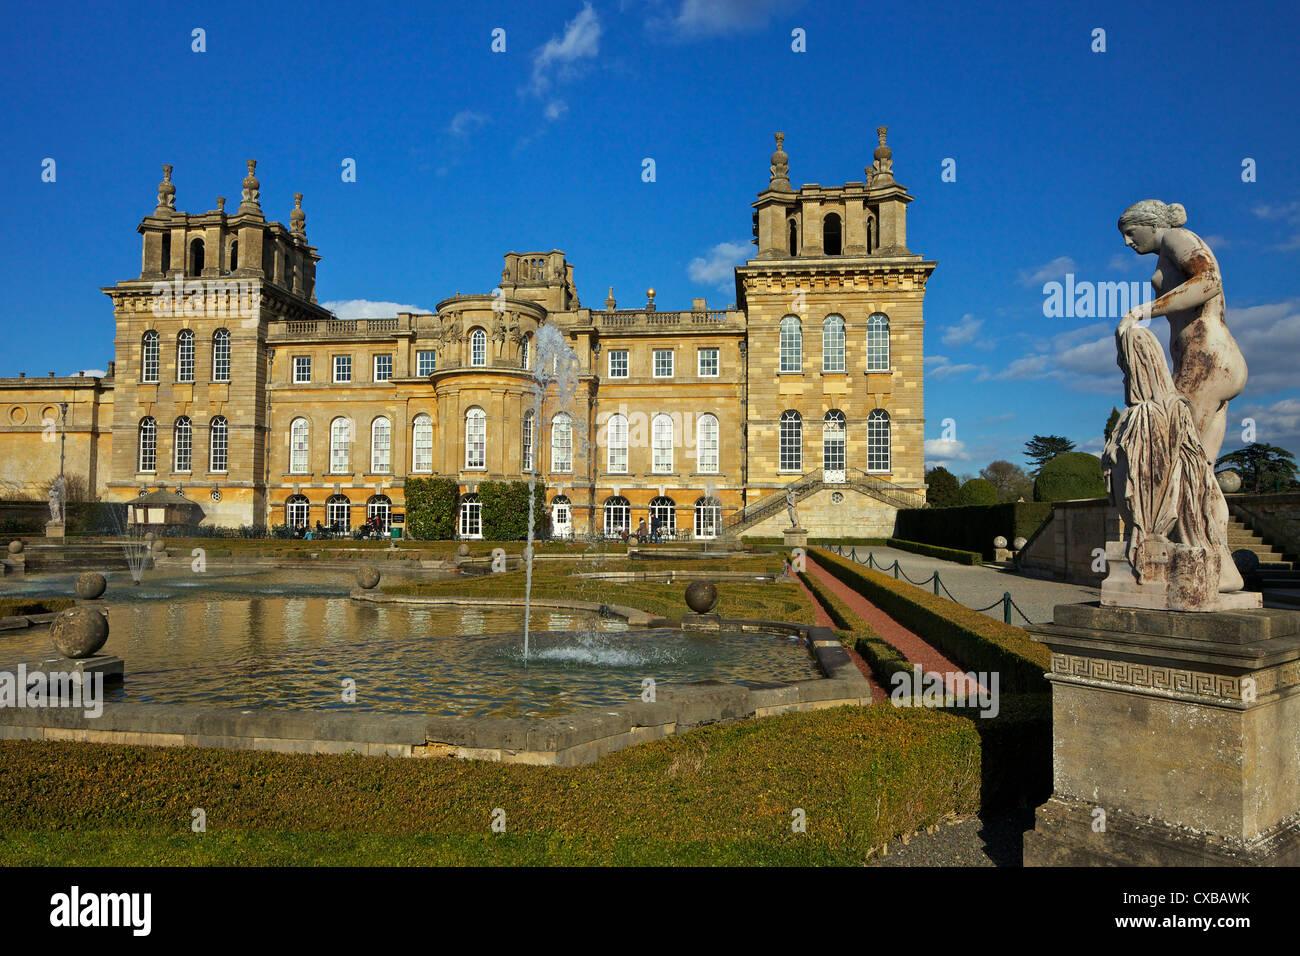 Water Gardens, Blenheim Palace, UNESCO World Heritage Site, Woodstock, Oxfordshire, England, United Kingdom, Europe - Stock Image